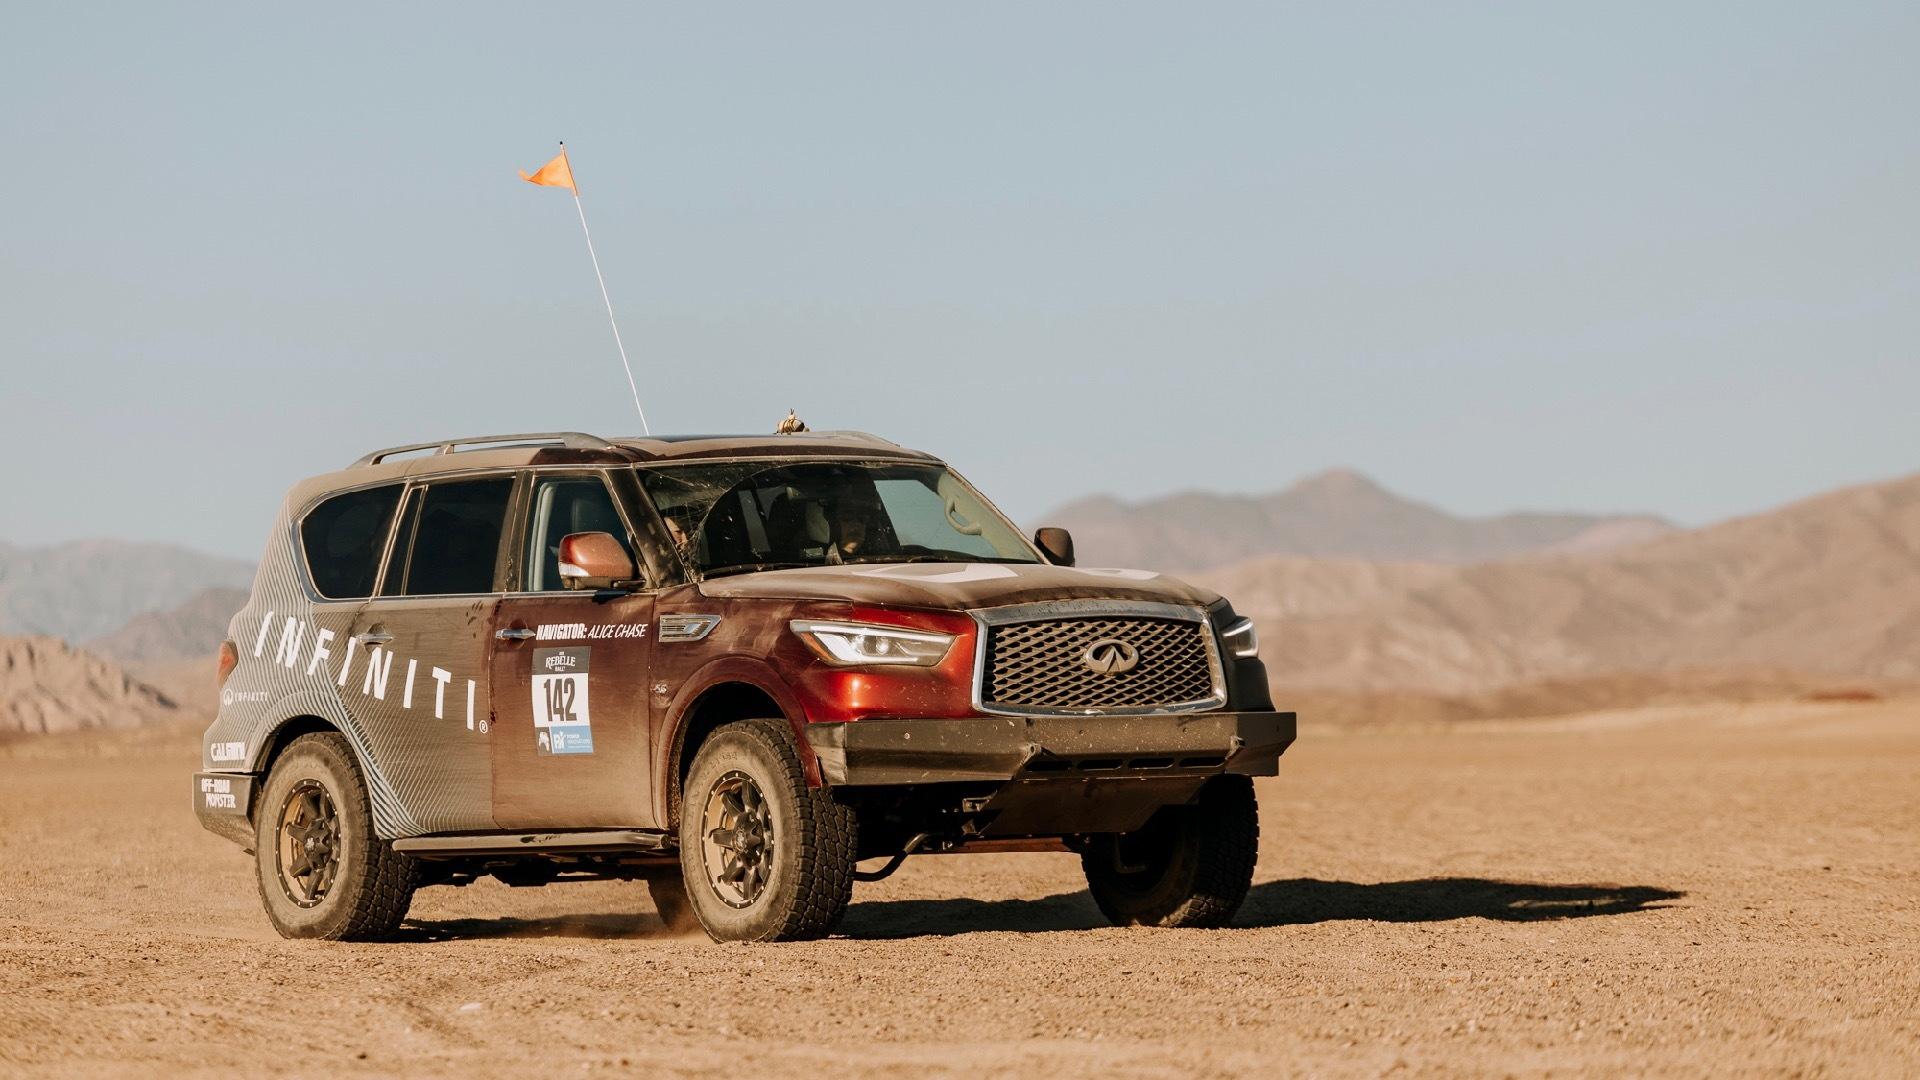 2021 Infiniti QX80 Rebelle Rally